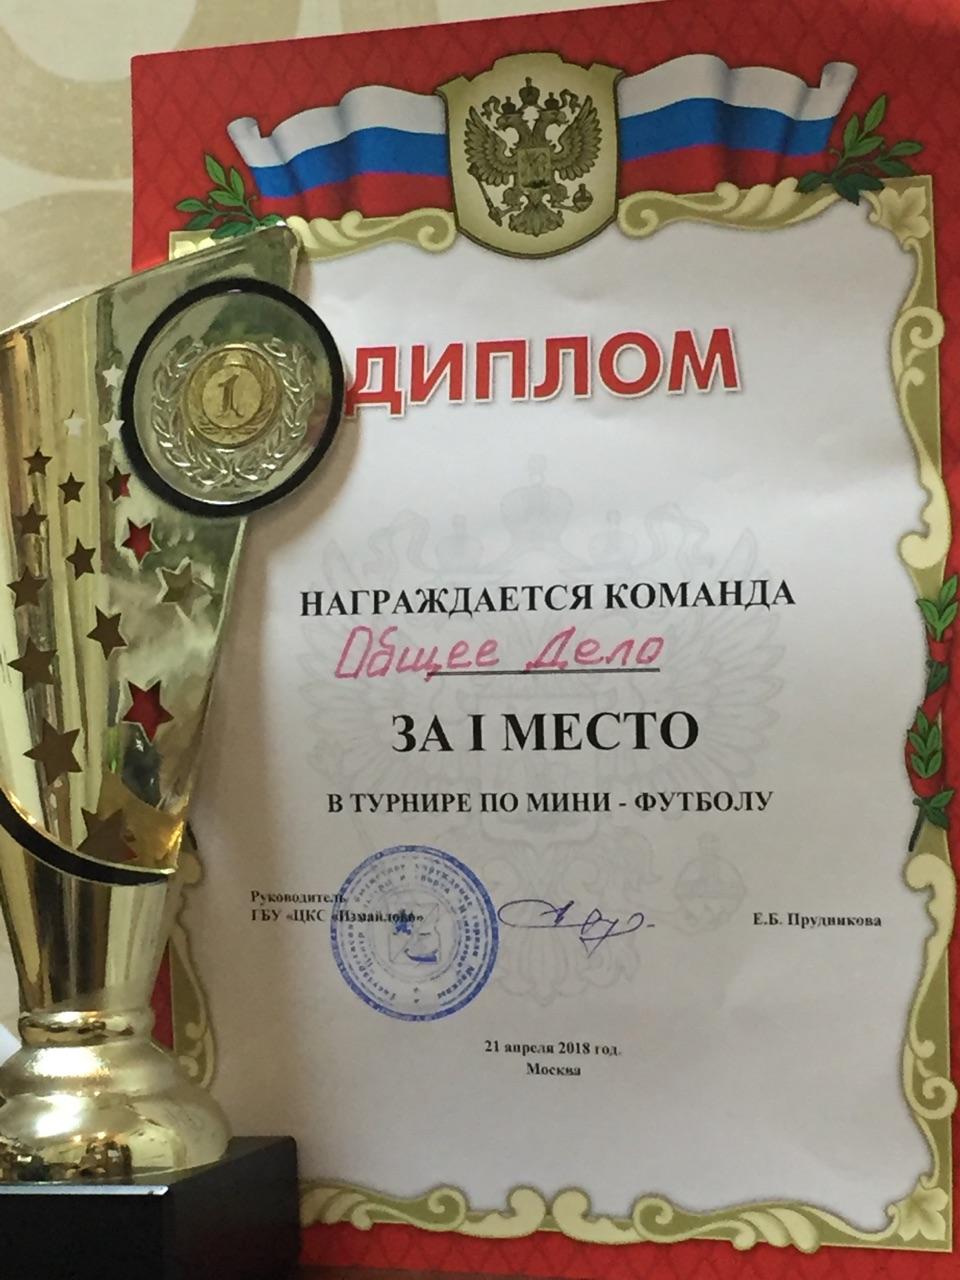 "Команда ""Общее дело"" на турнире по мини-футболу в Москве"